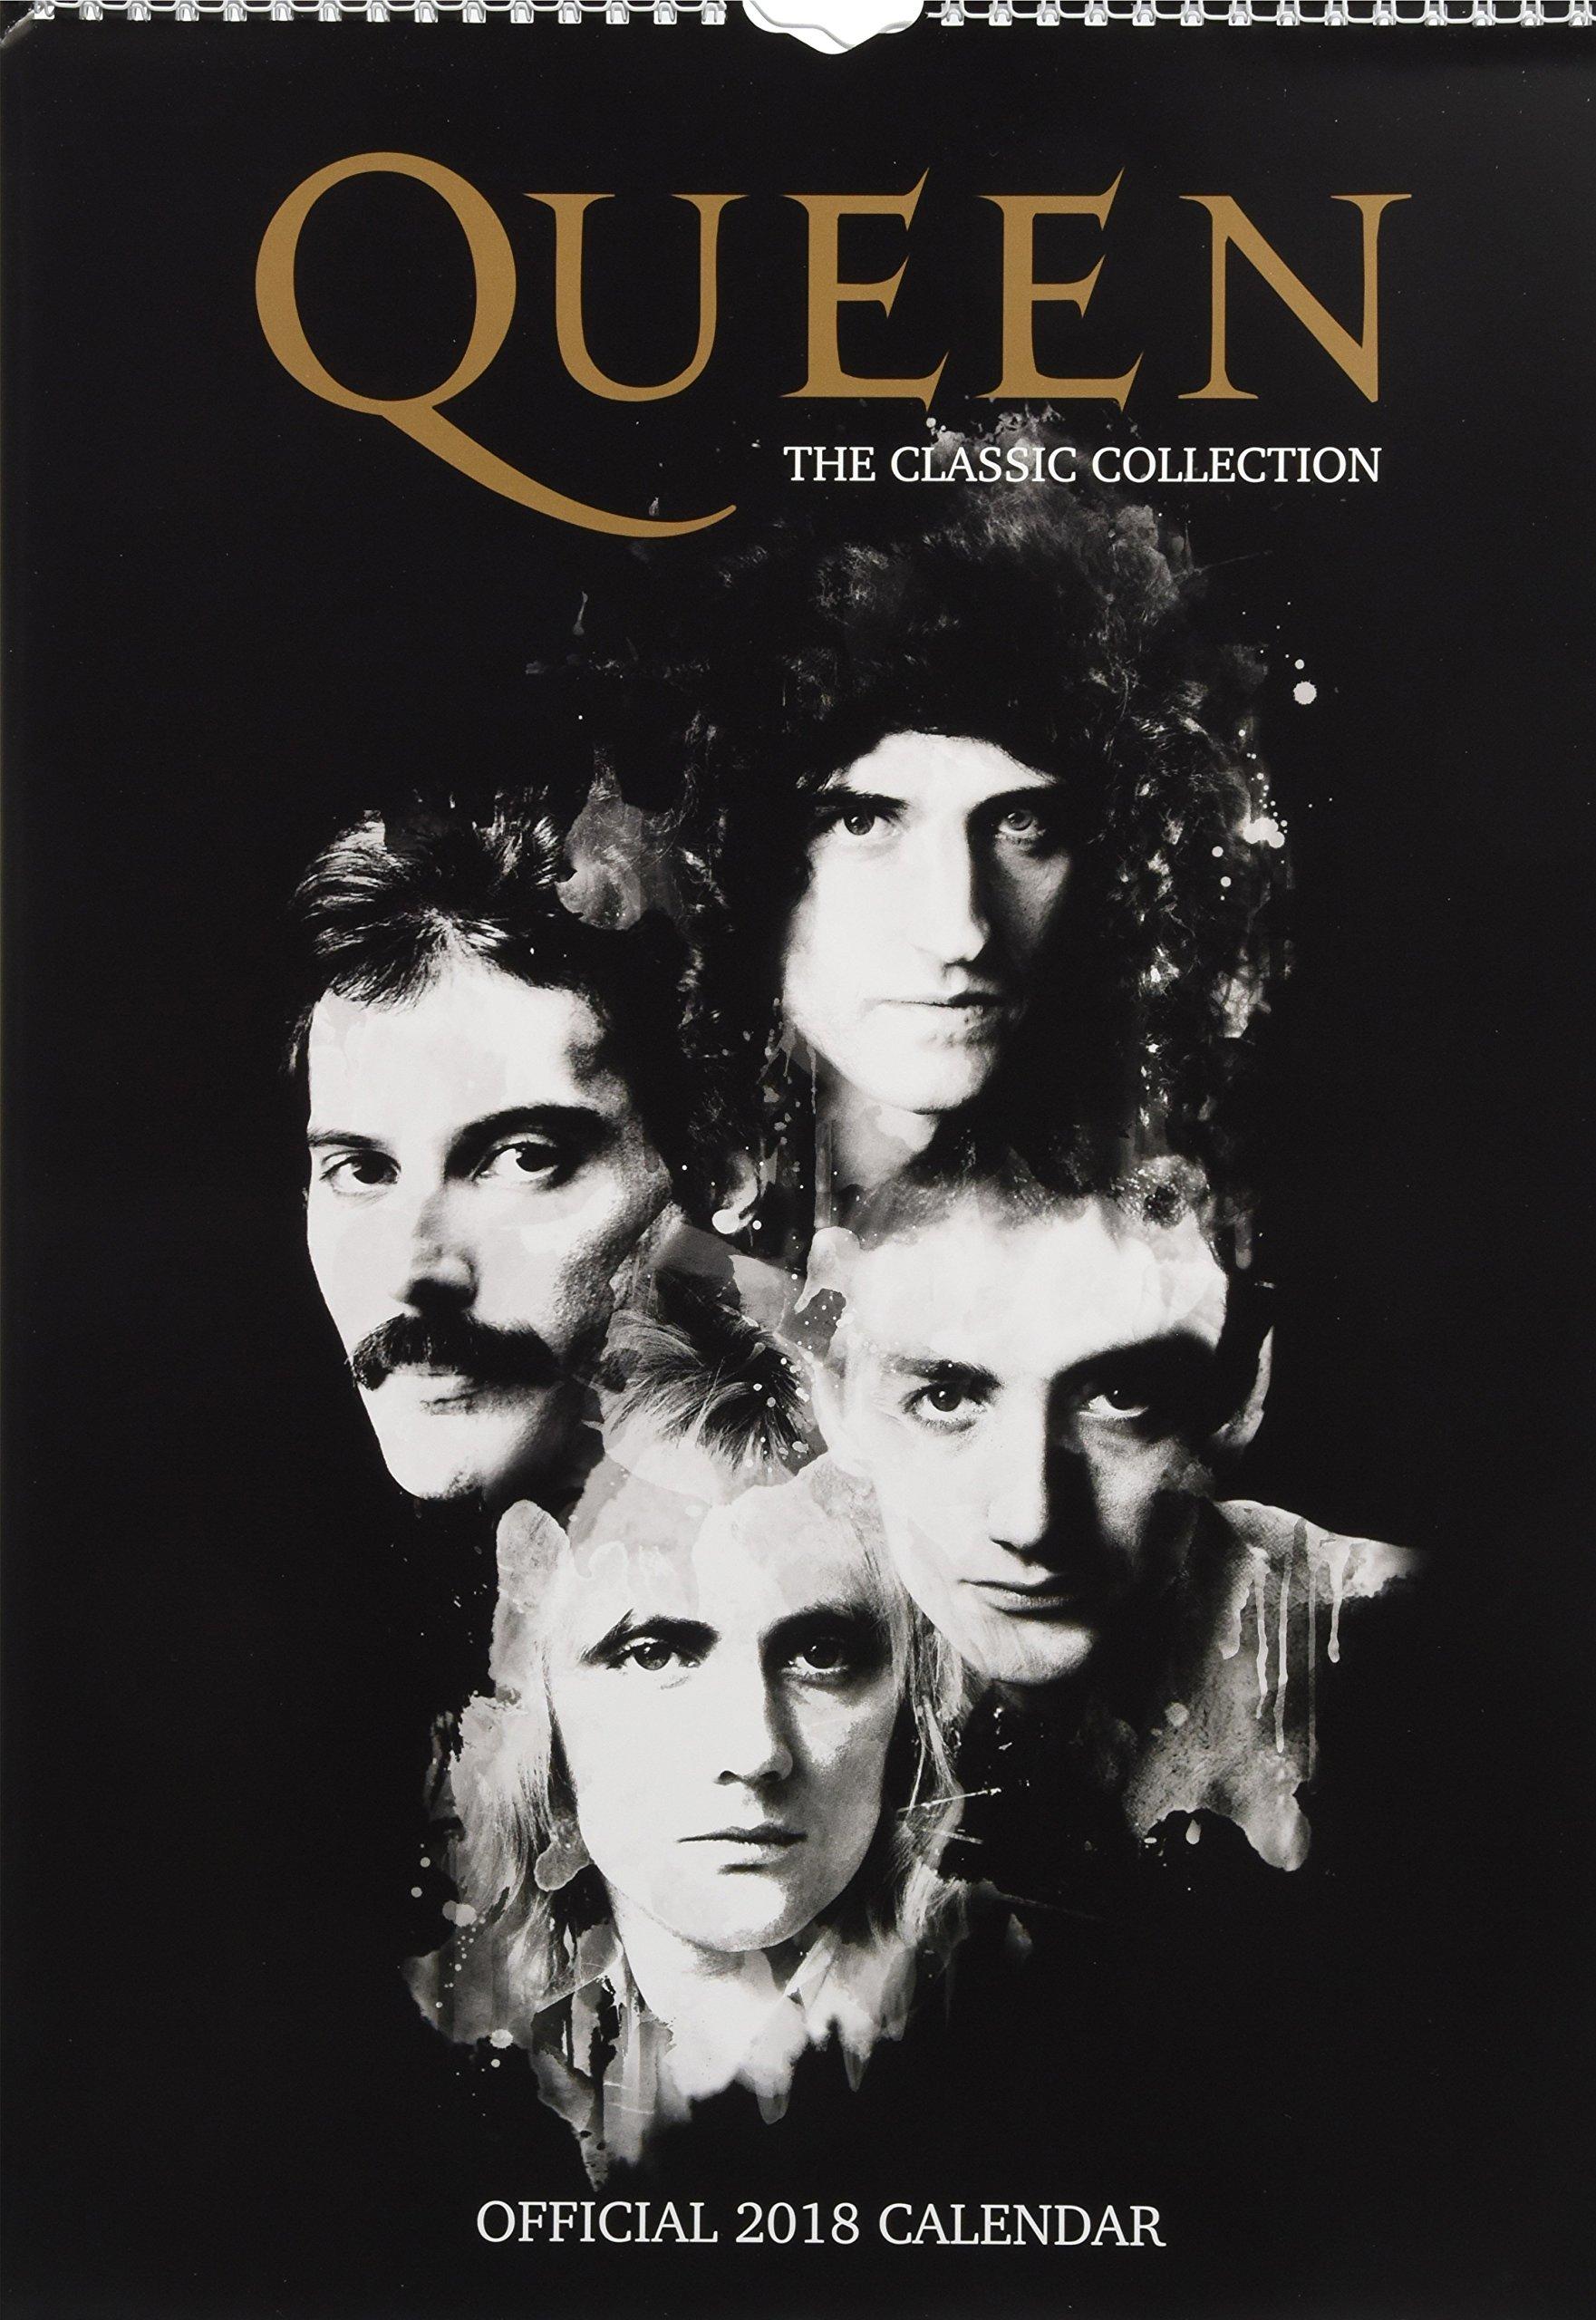 queen official 2018 calendar a3 poster format 9781785493188 amazoncom books